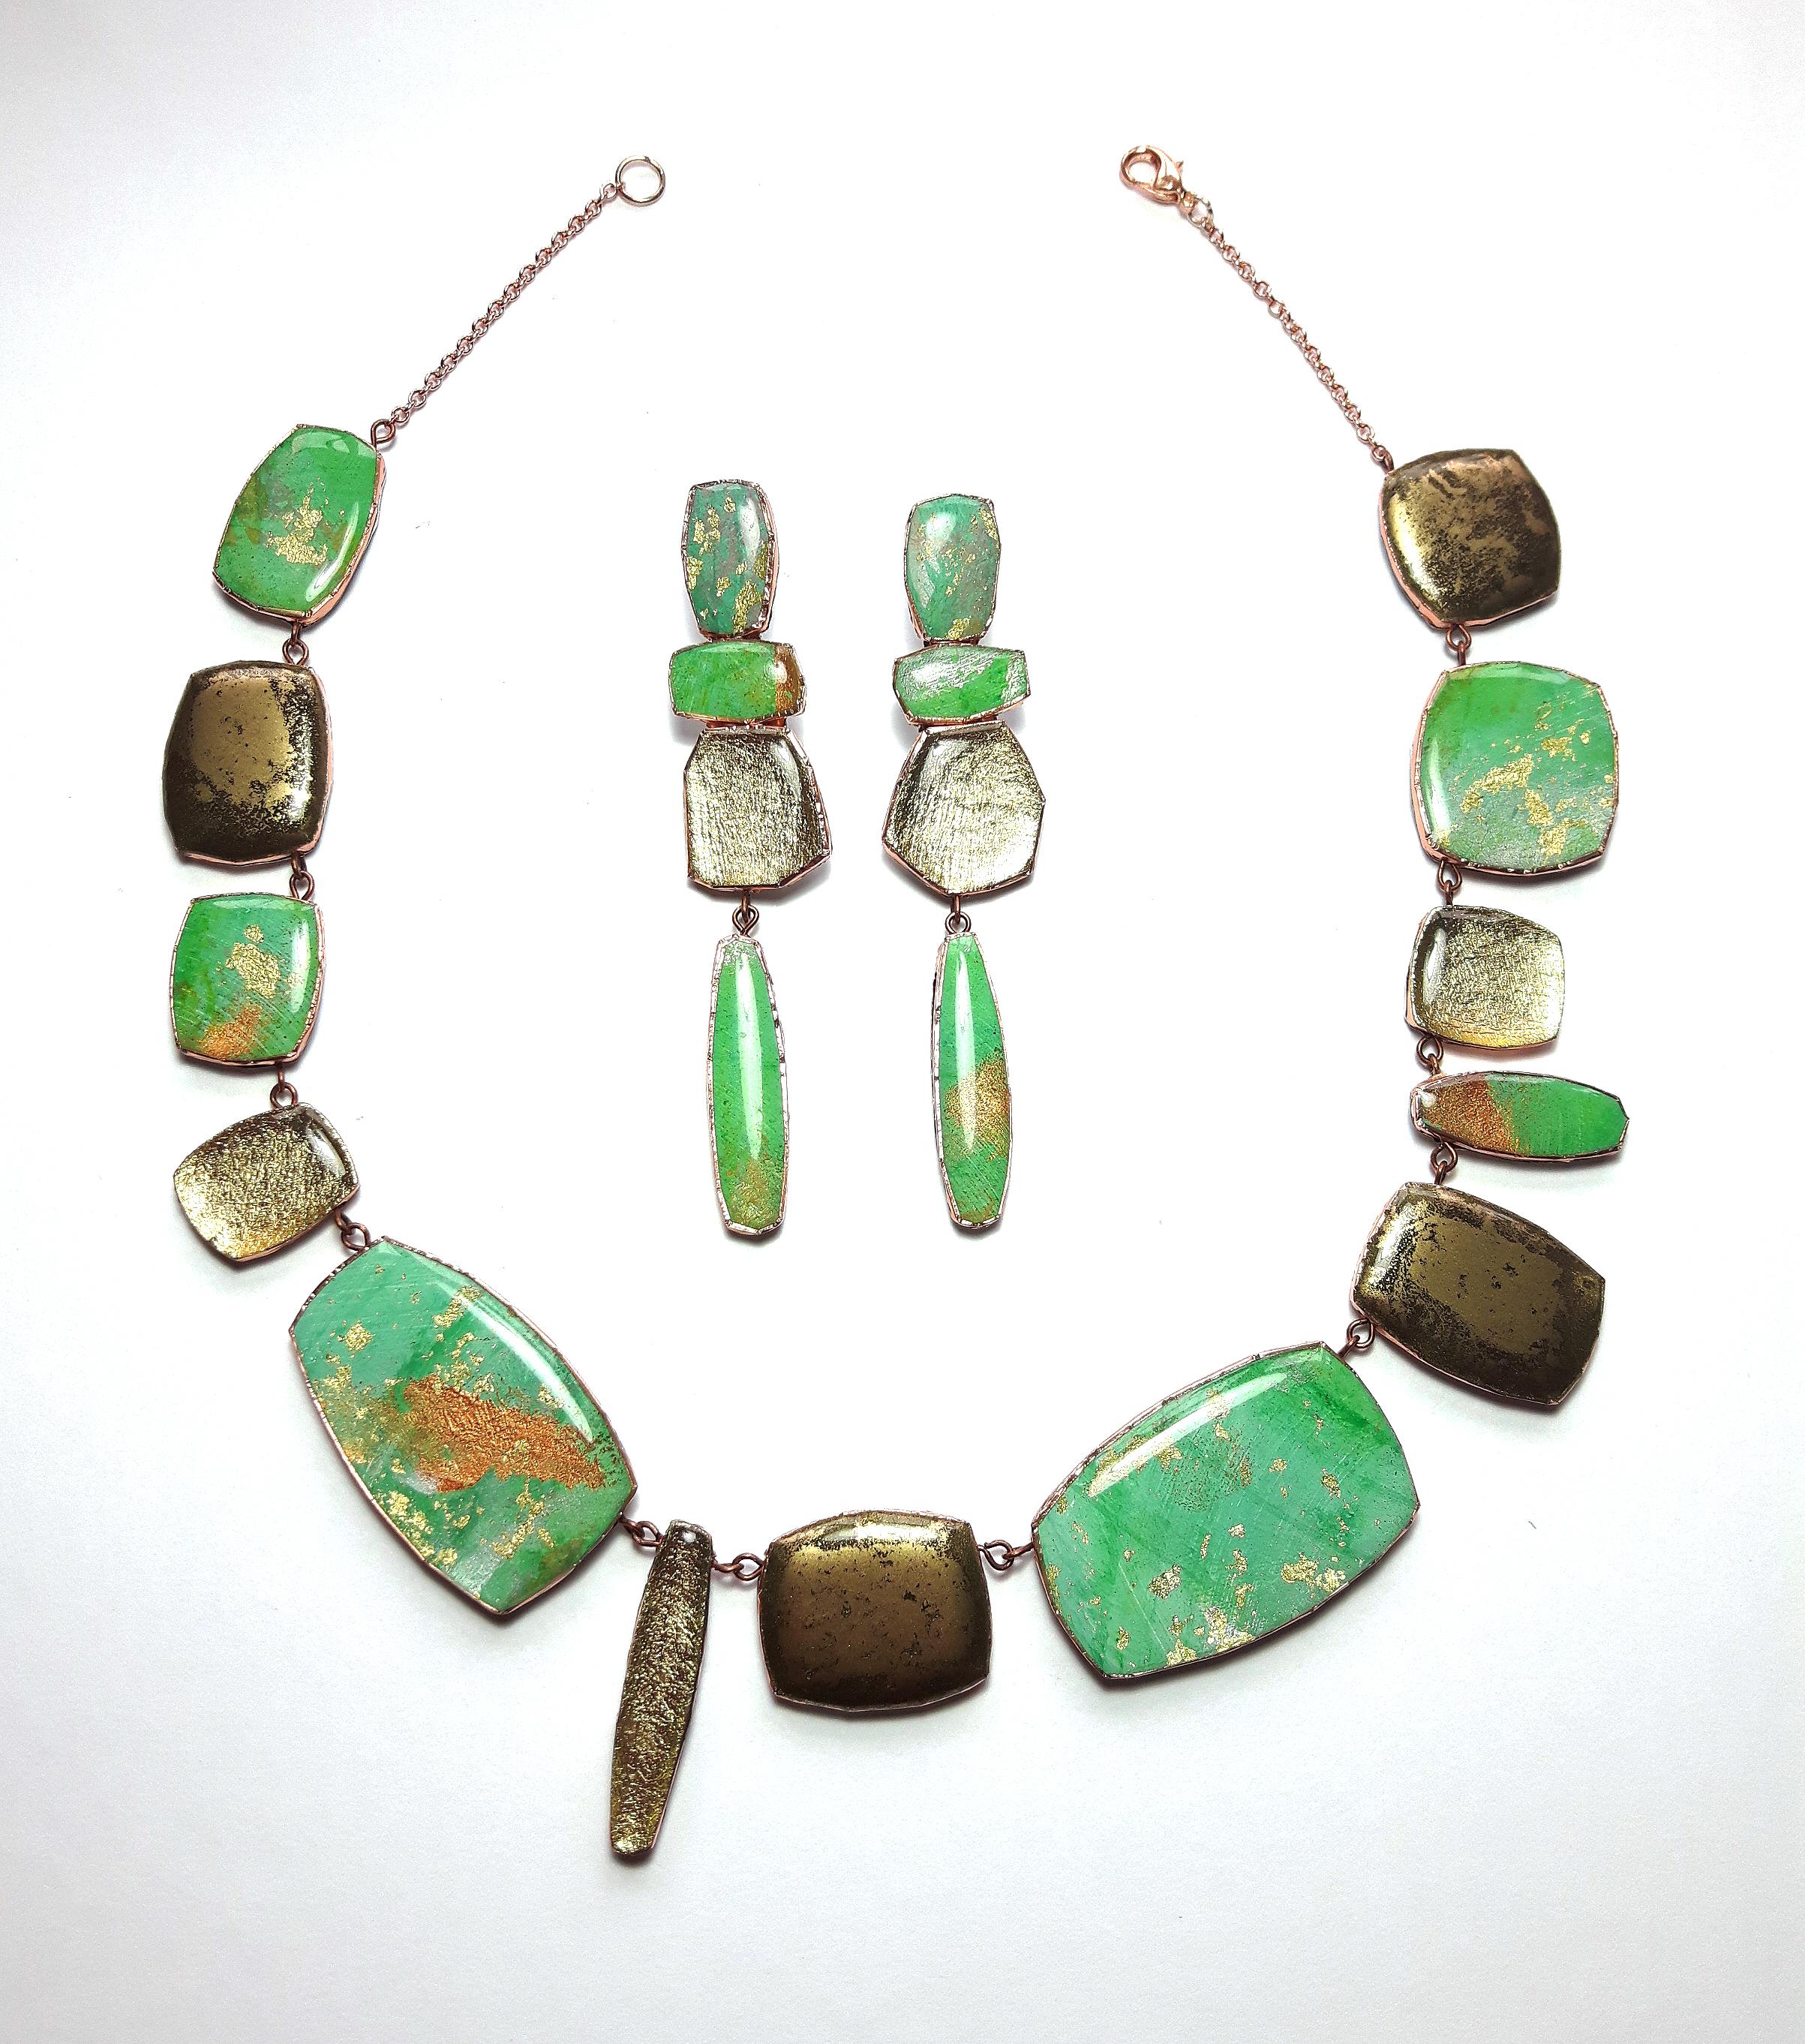 dee barnes green necklace set.jpg